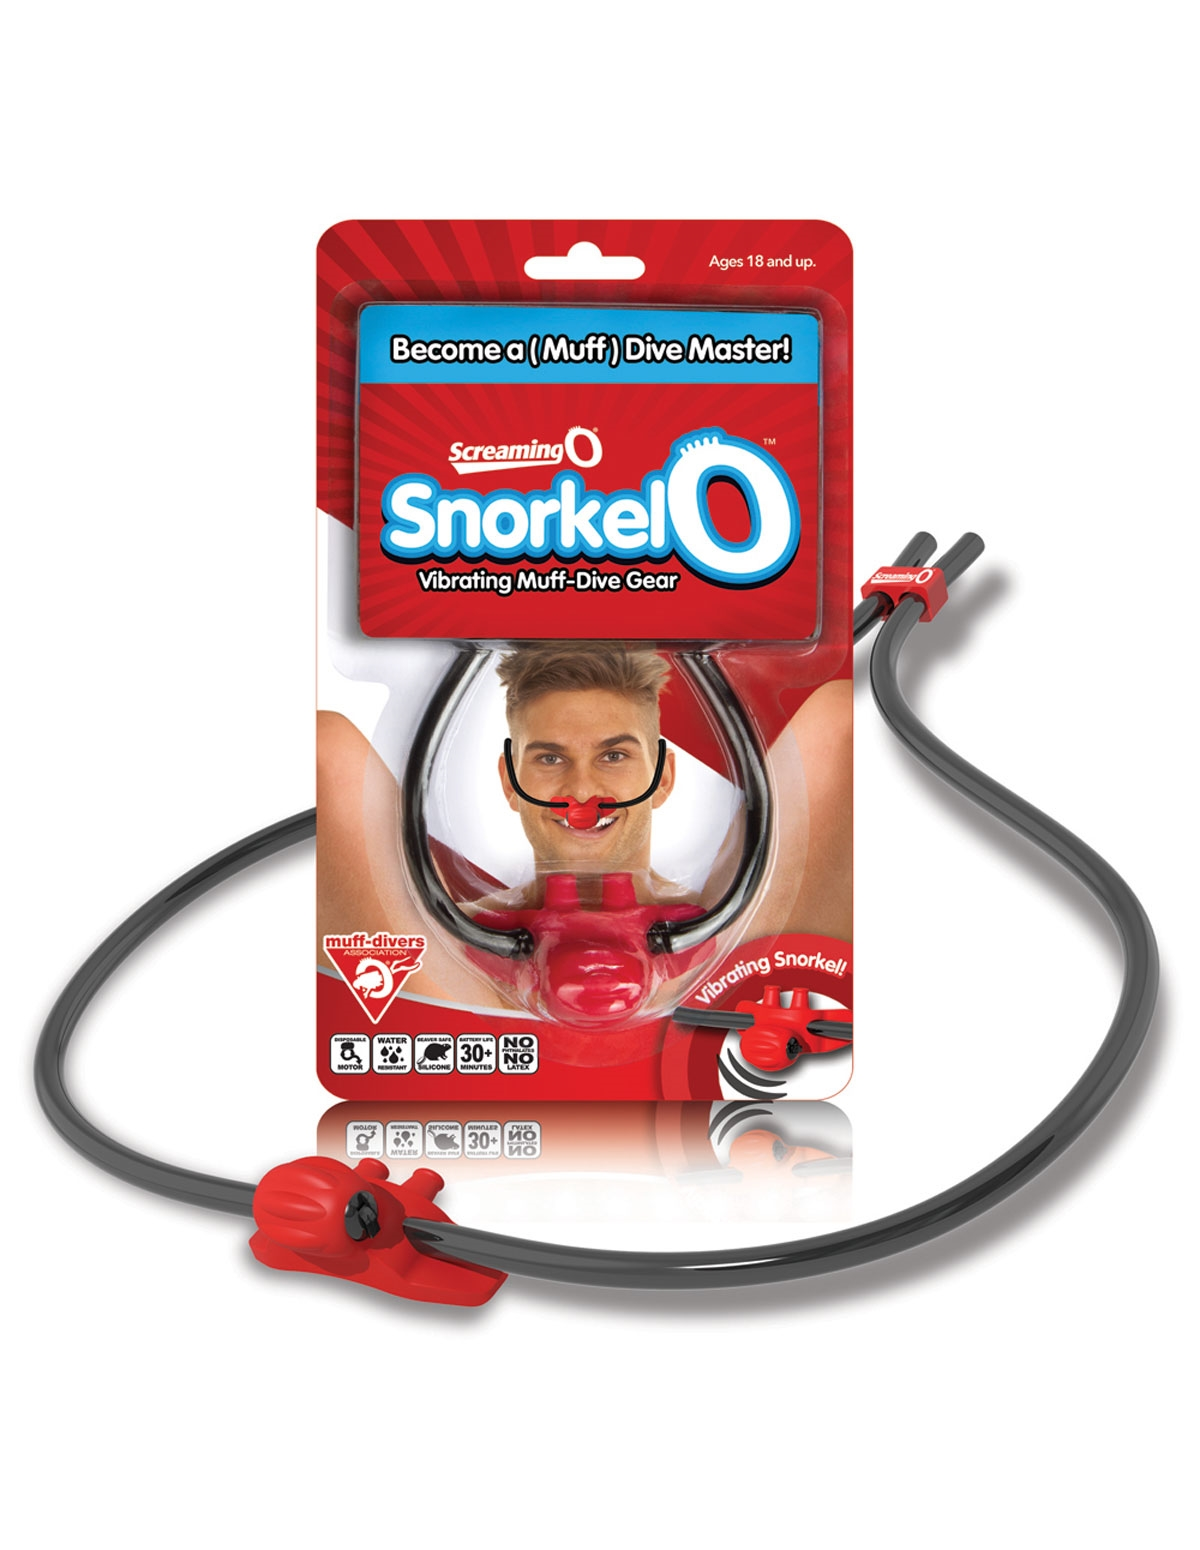 Screaming O Snorkel-O Vibrating Muff Dive Gear